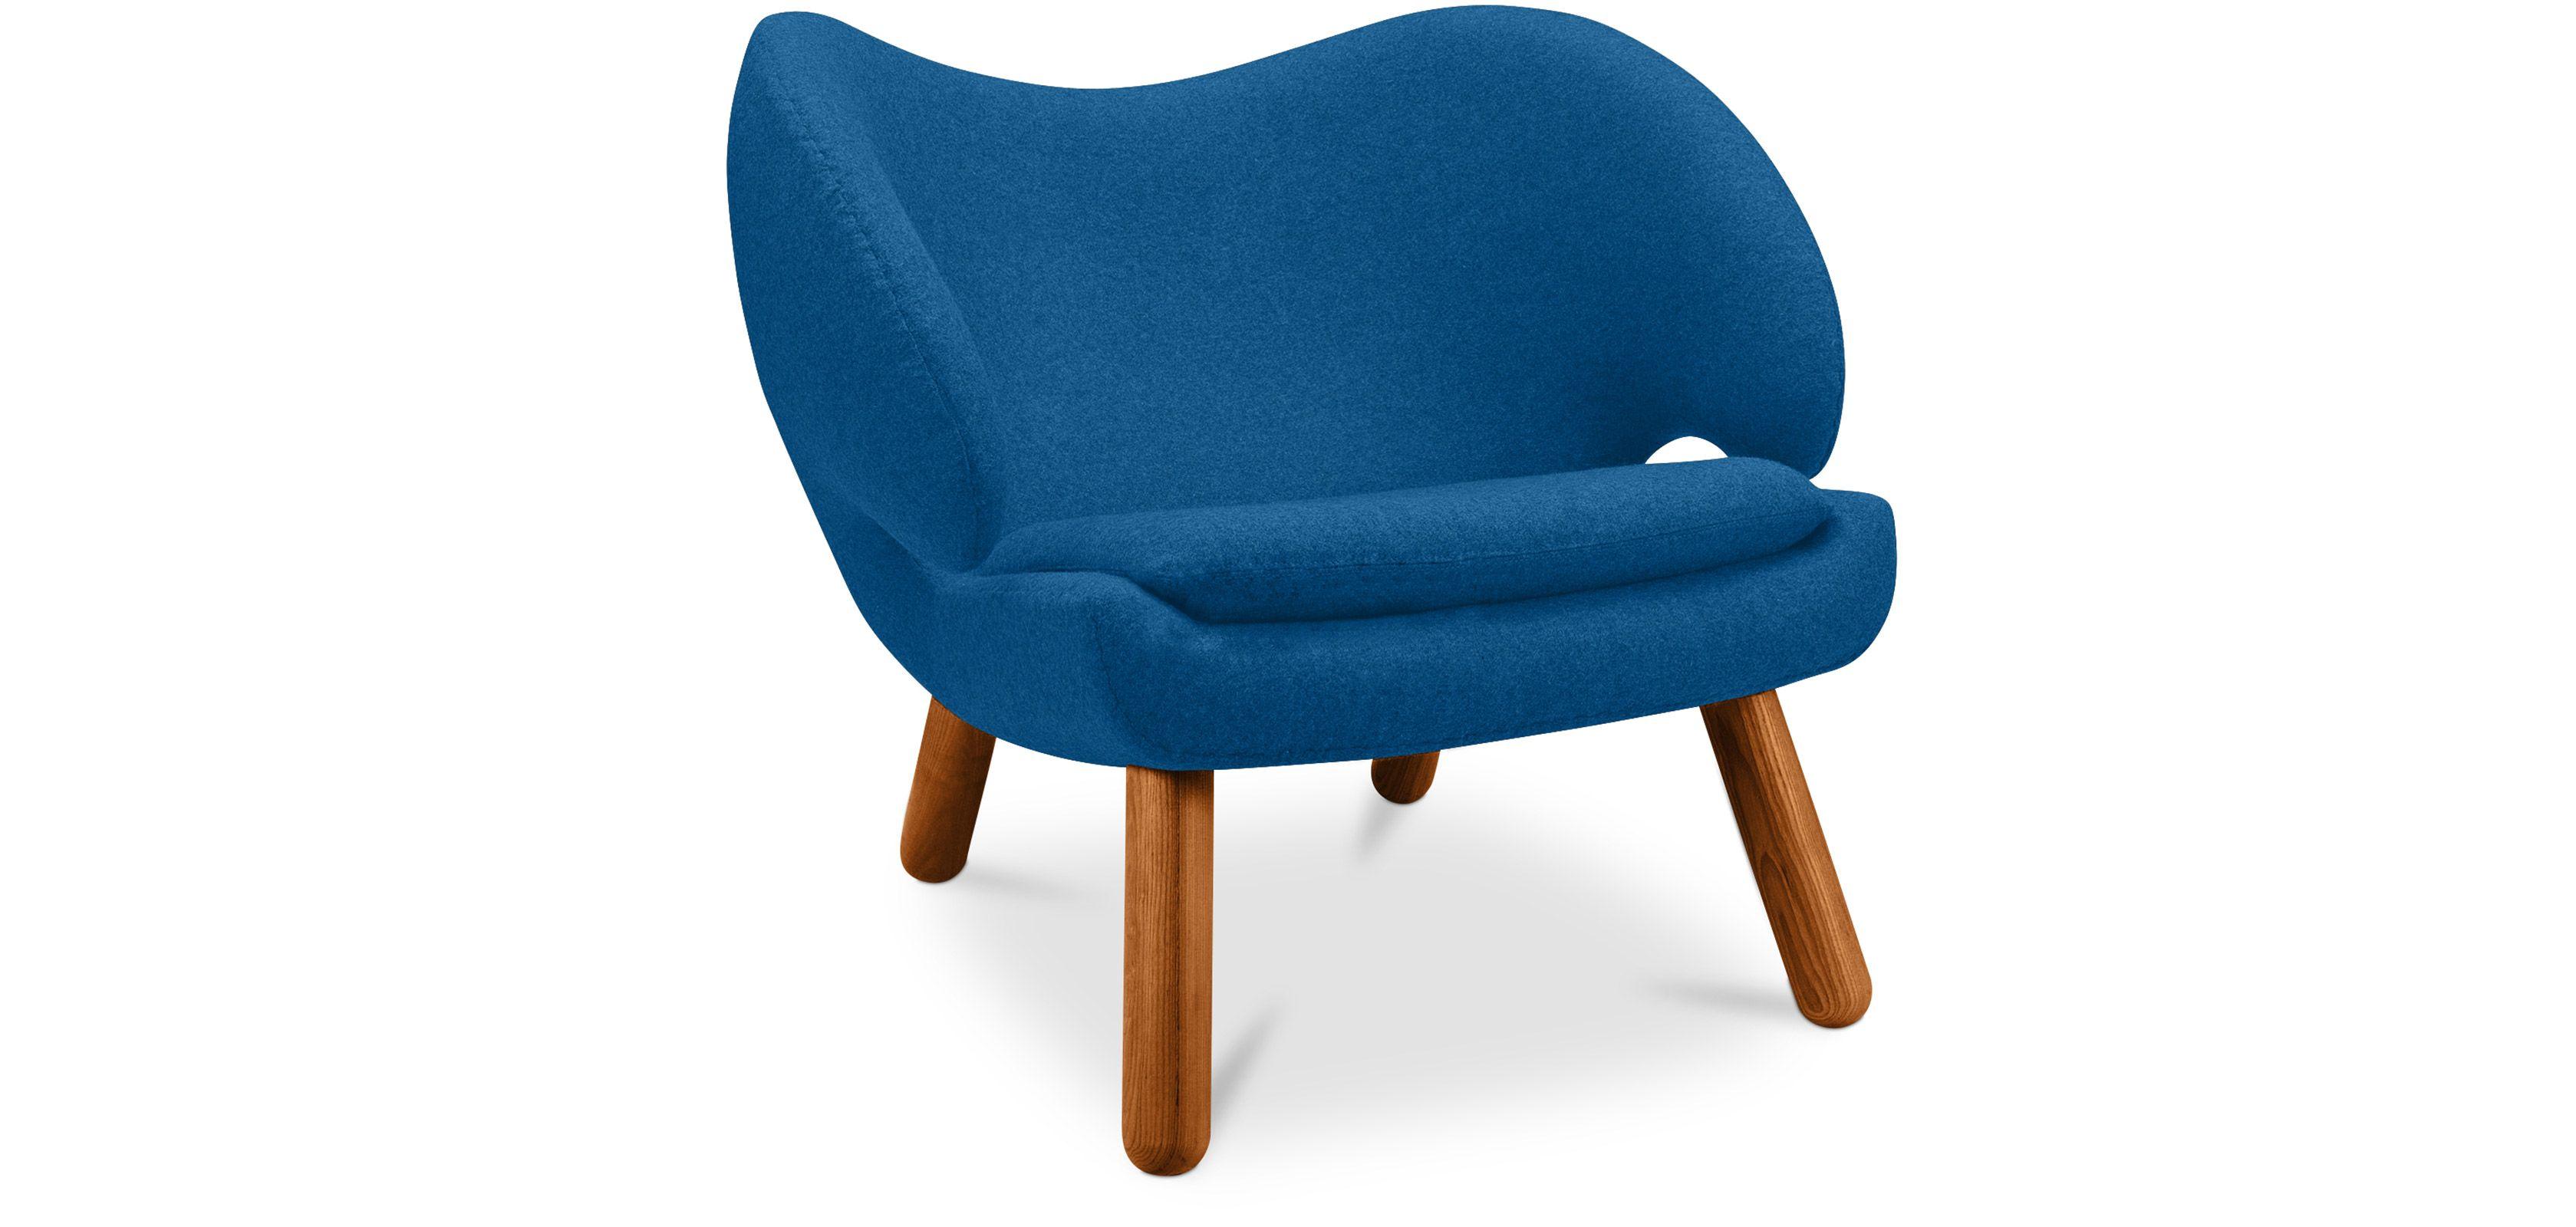 Fauteuil de salon Pélican Design scandinave style Finn Juhl